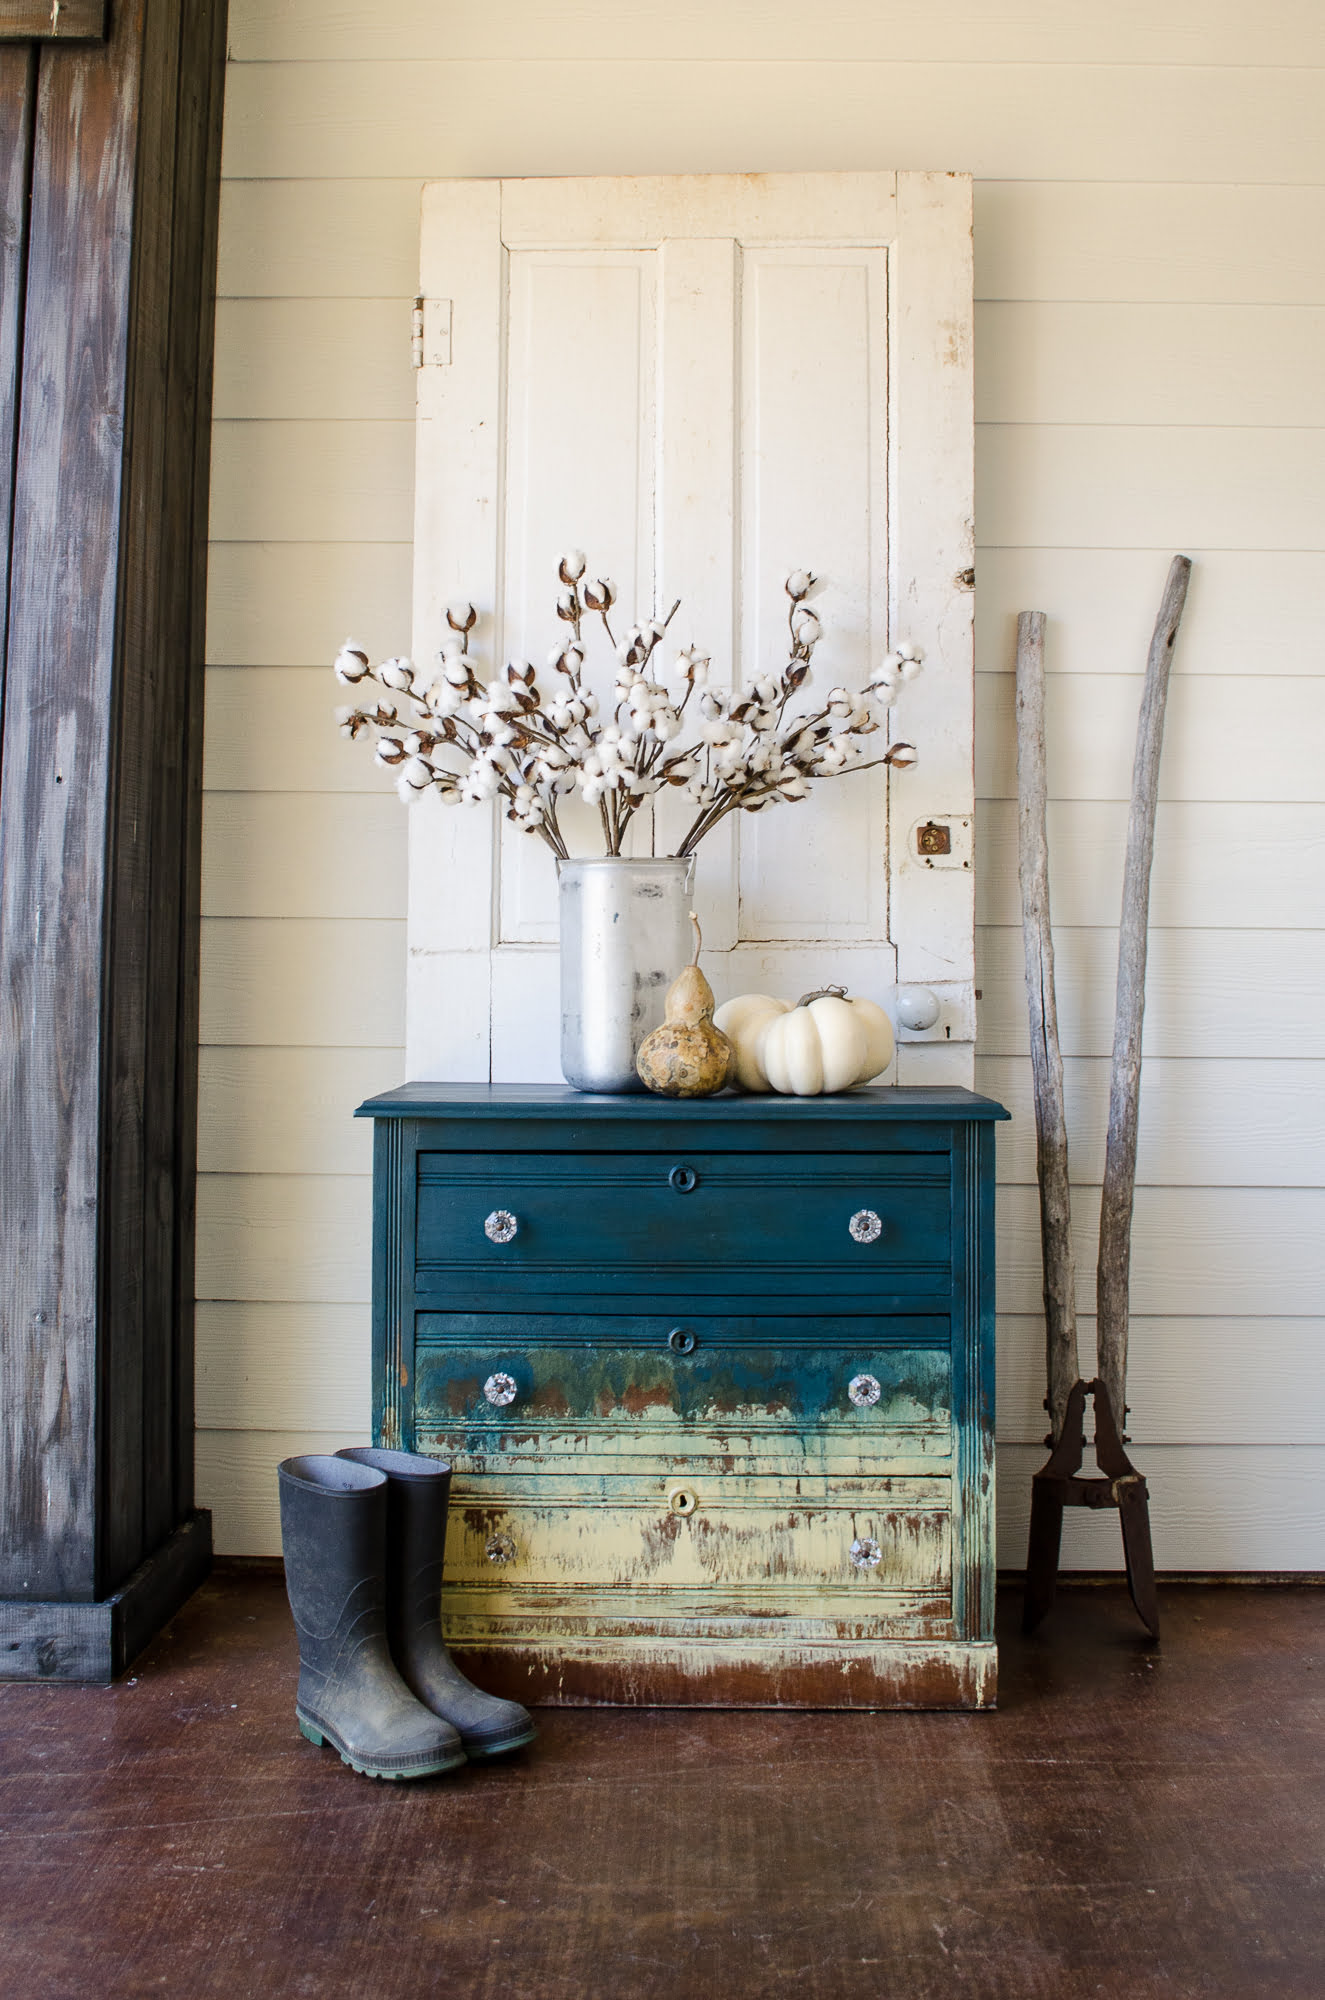 Artistic Design for Furniture